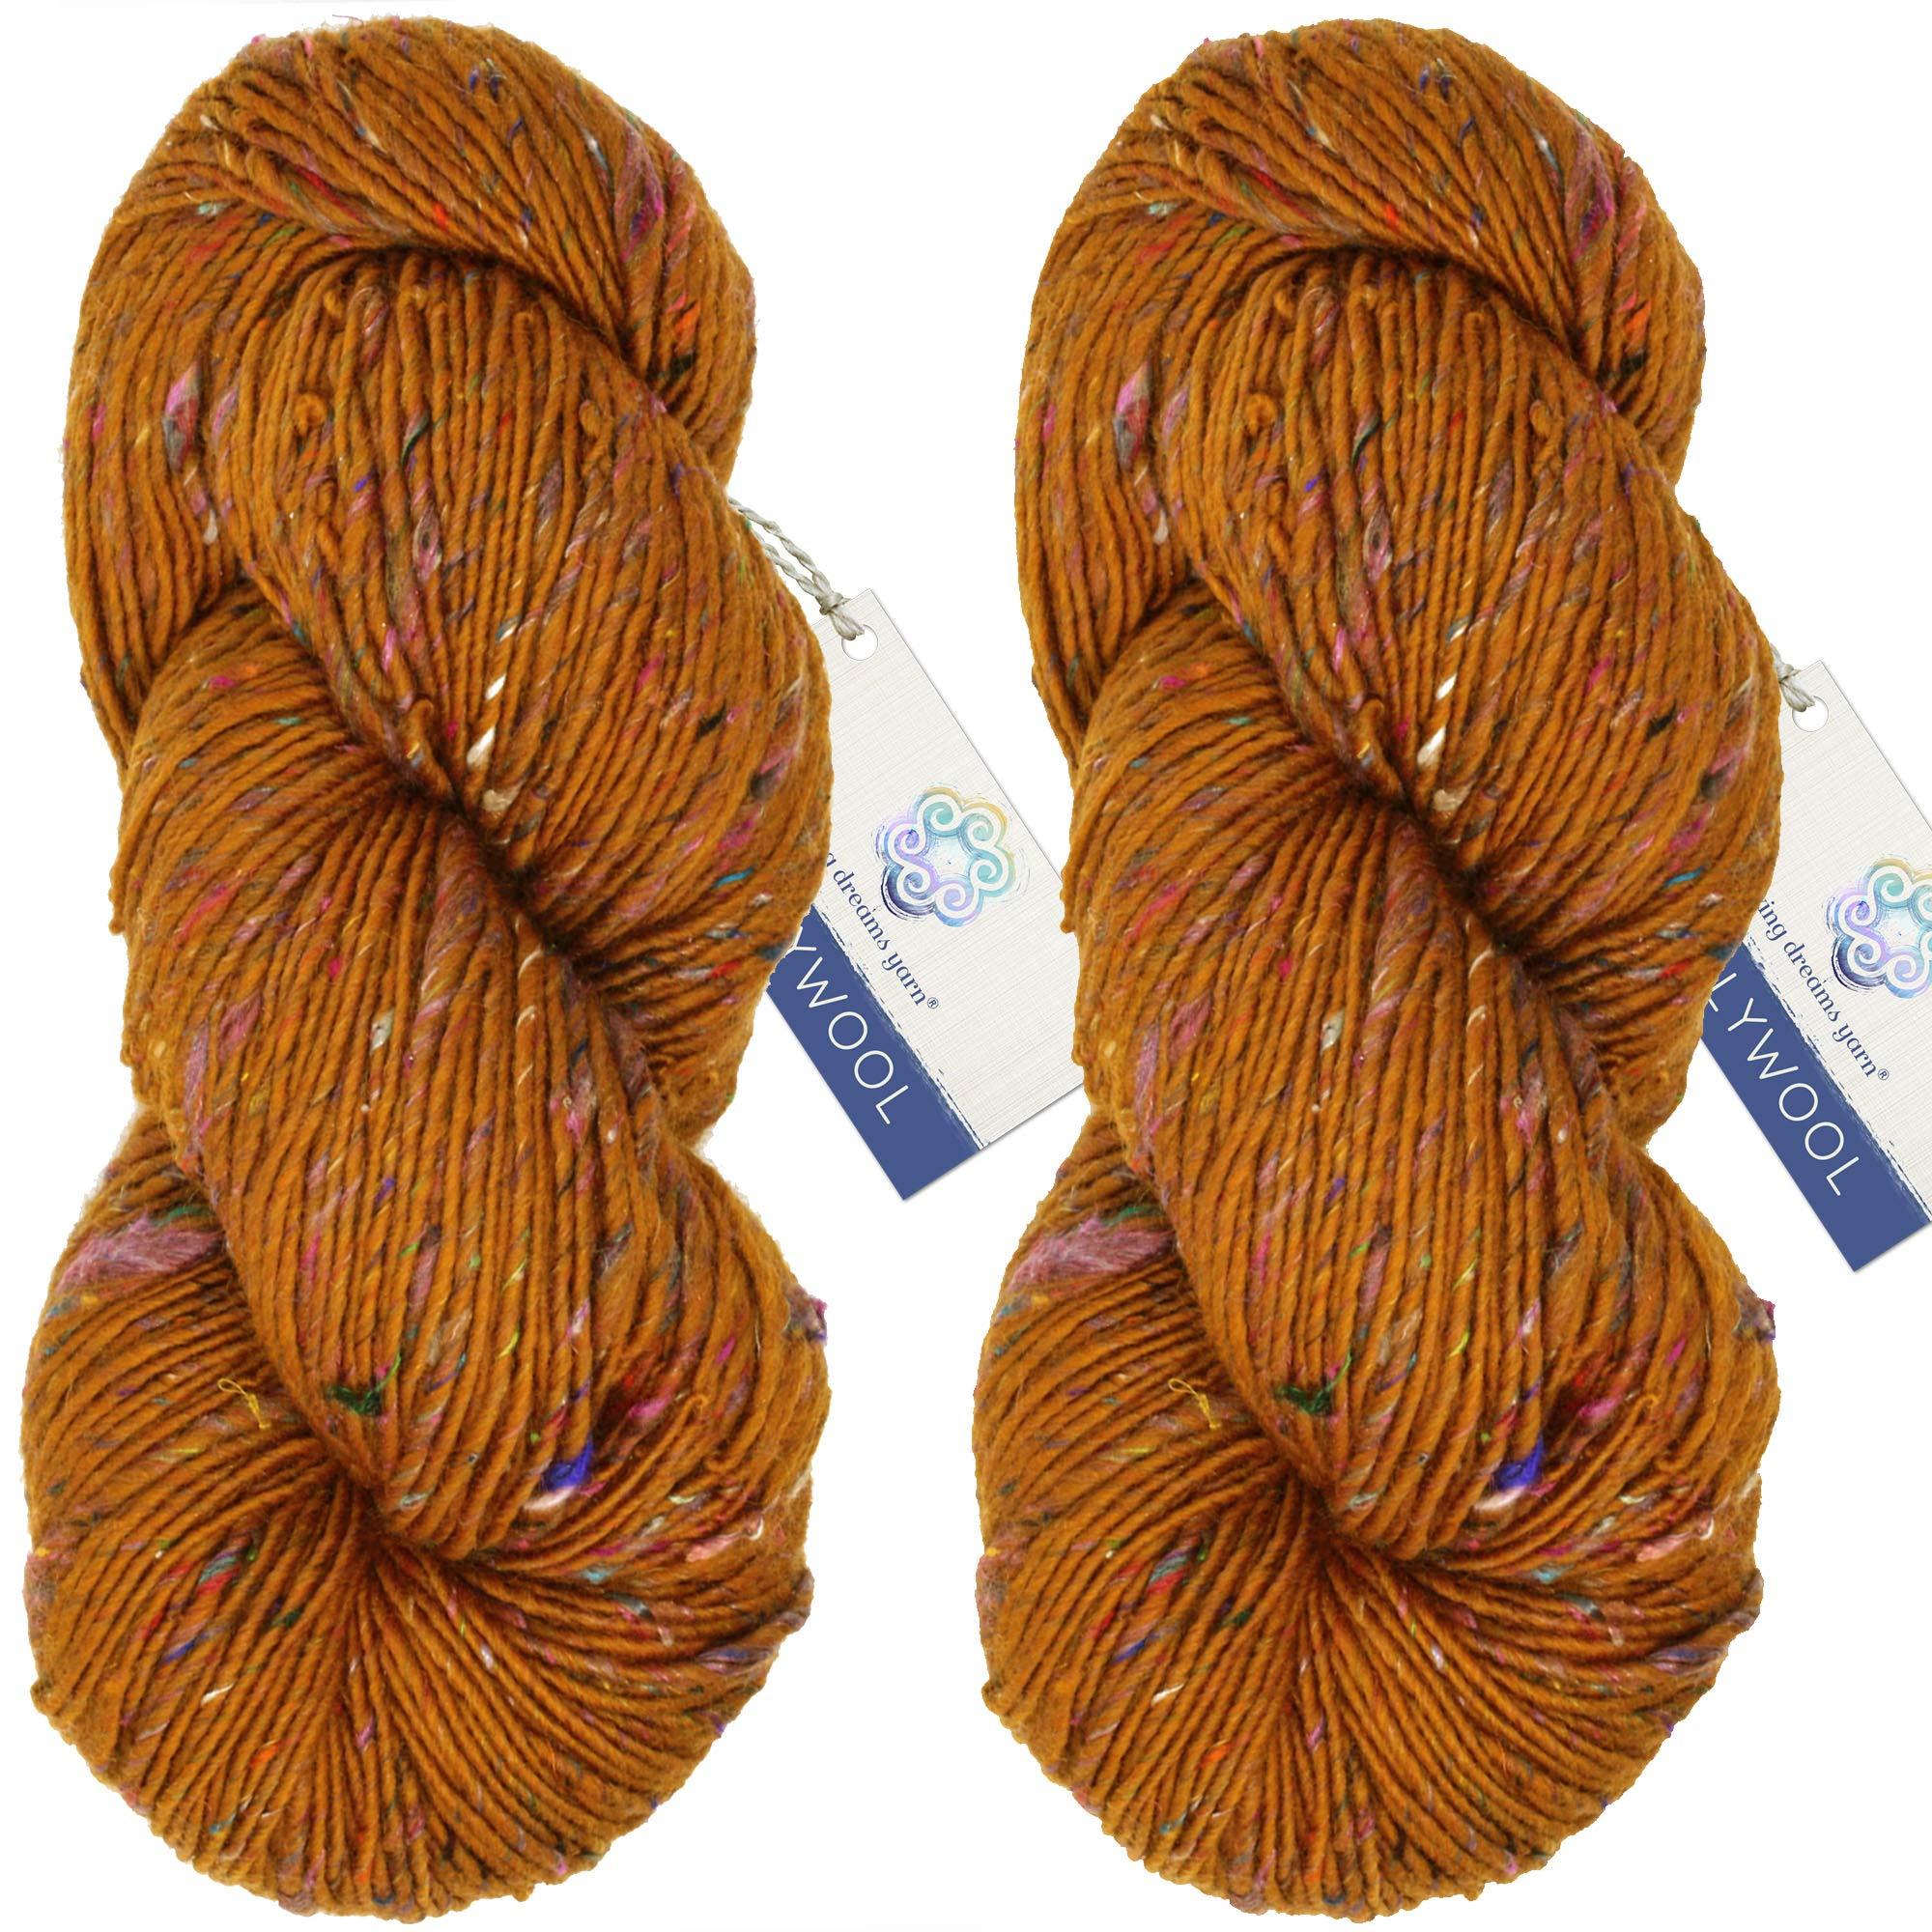 Living Dreams Yarn BOLLYWOOL DK. Super Soft Merino and Sari Silk. Colorful Tweed Yarn with Boho Flair. Homespun in USA. Two Pack, Taj Mahal